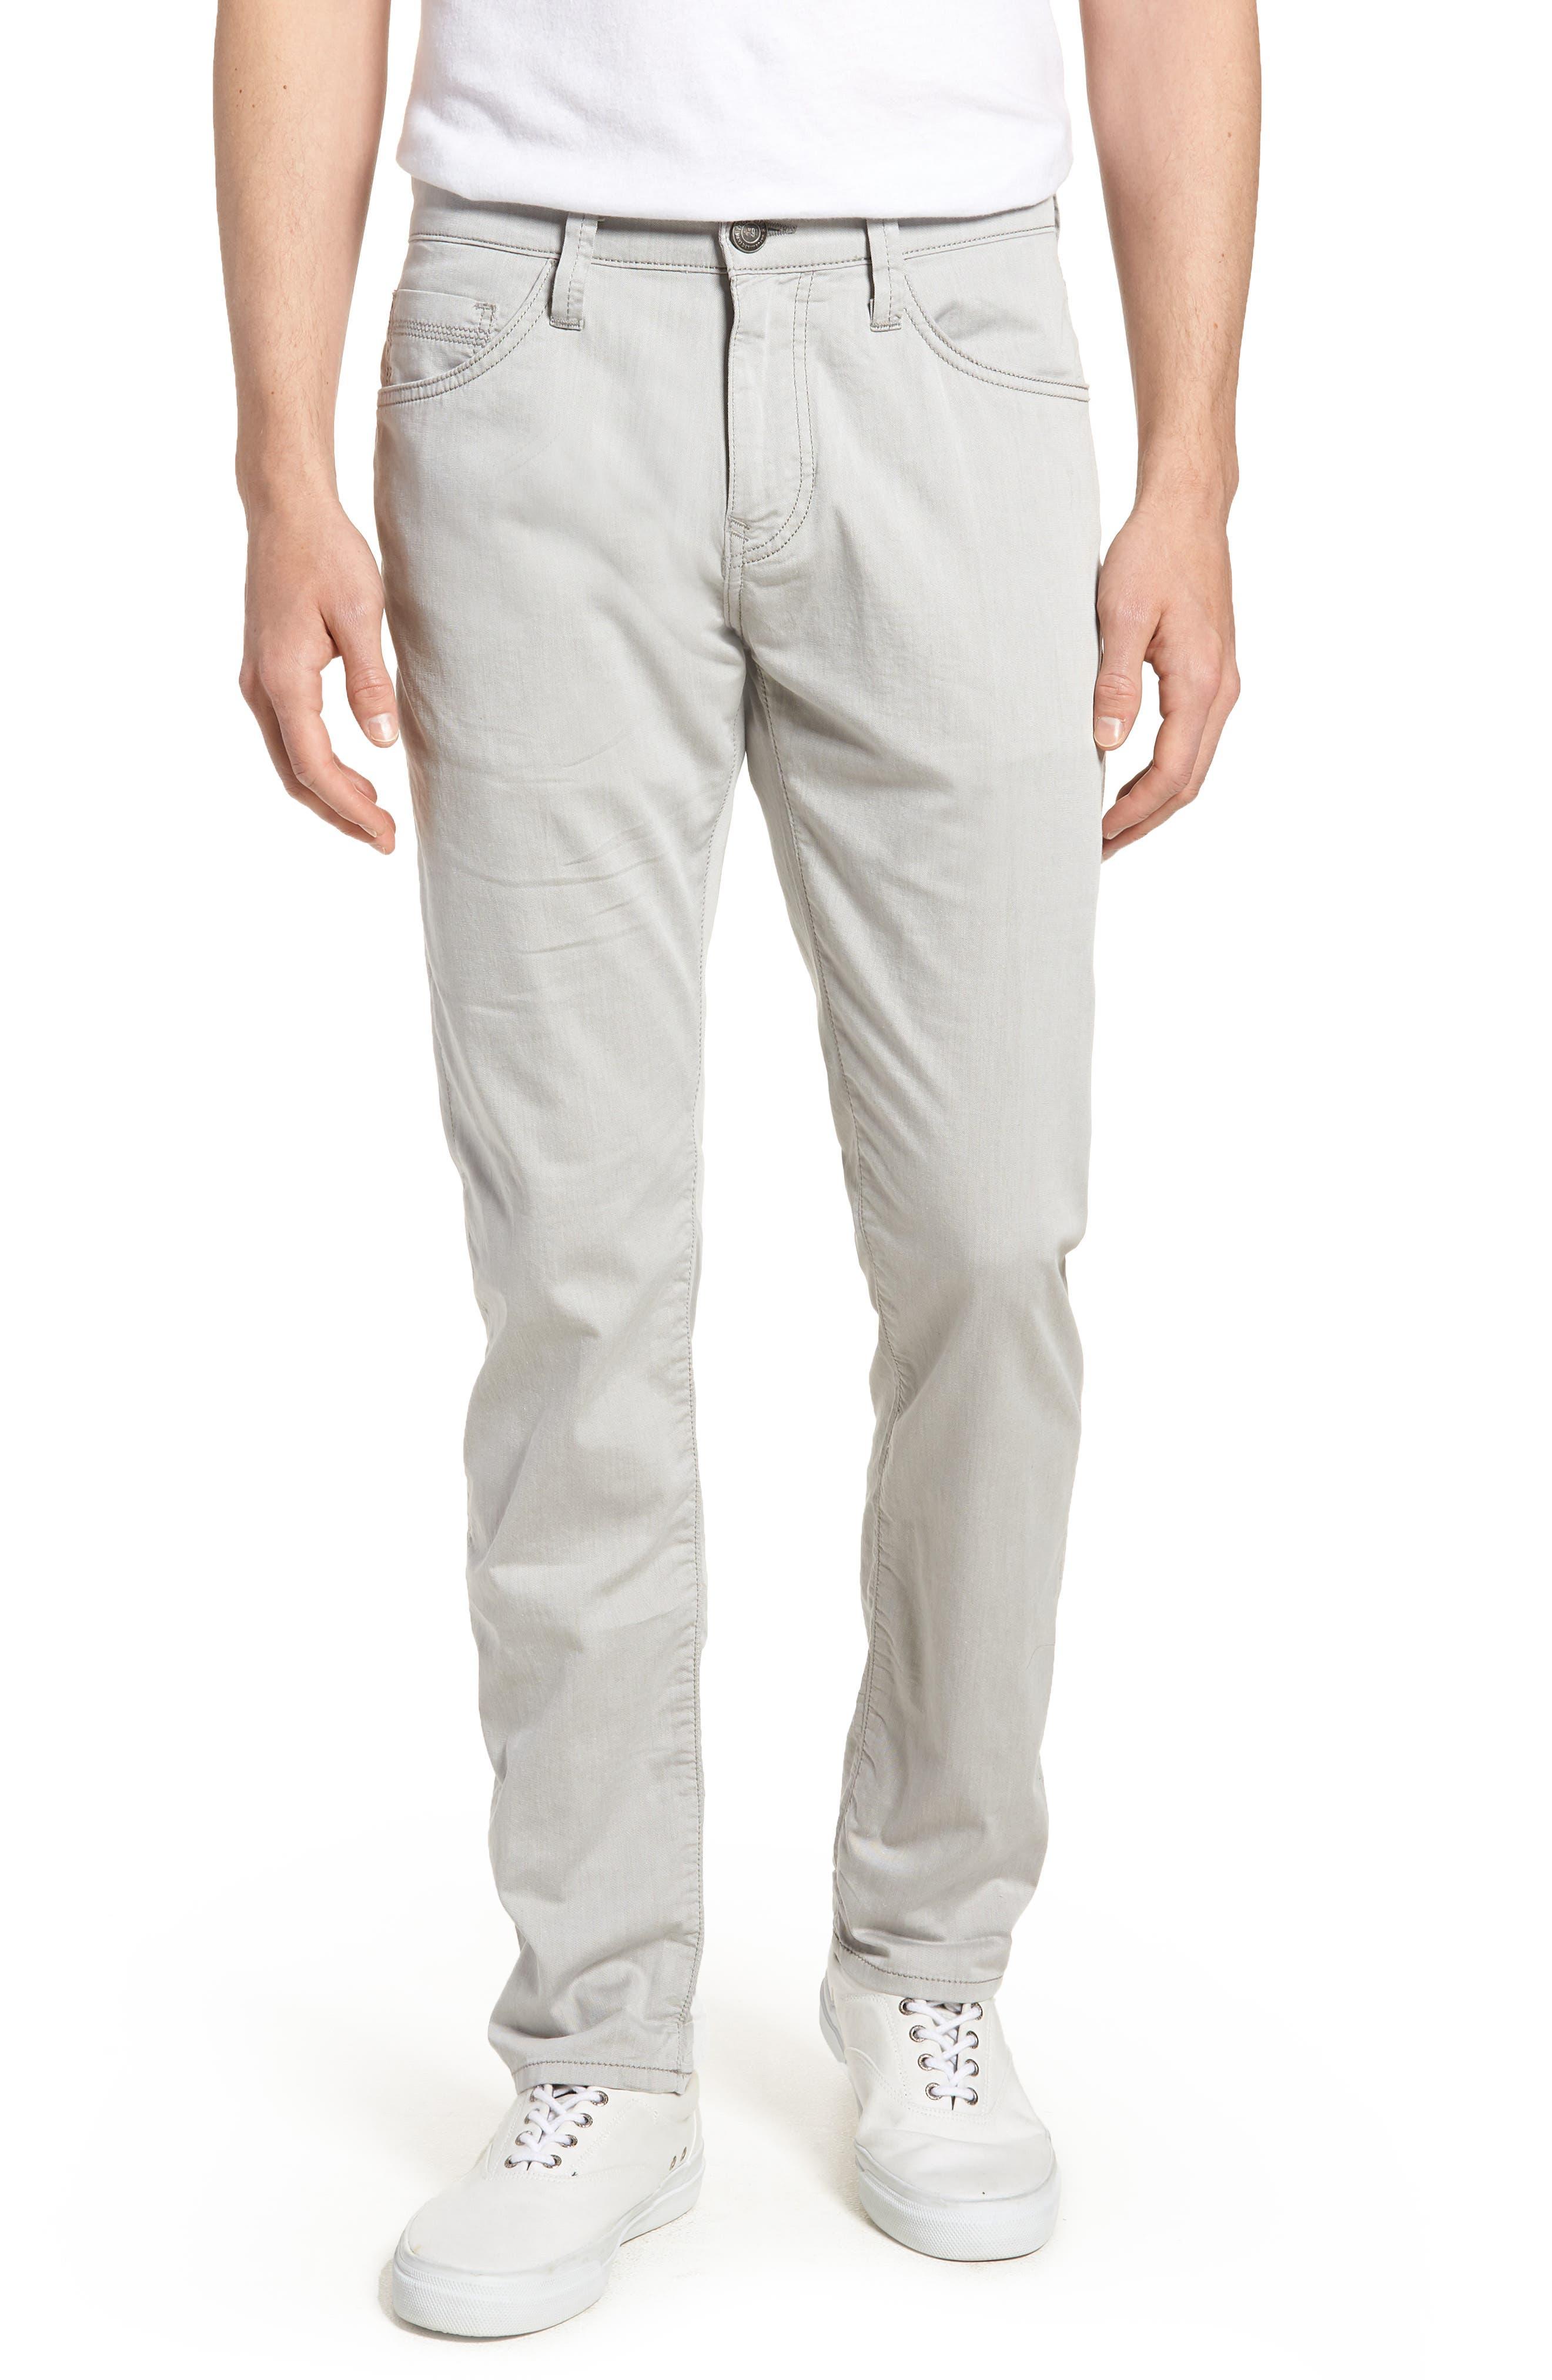 Jake Slim Fit Jeans,                         Main,                         color, Latte Reversed